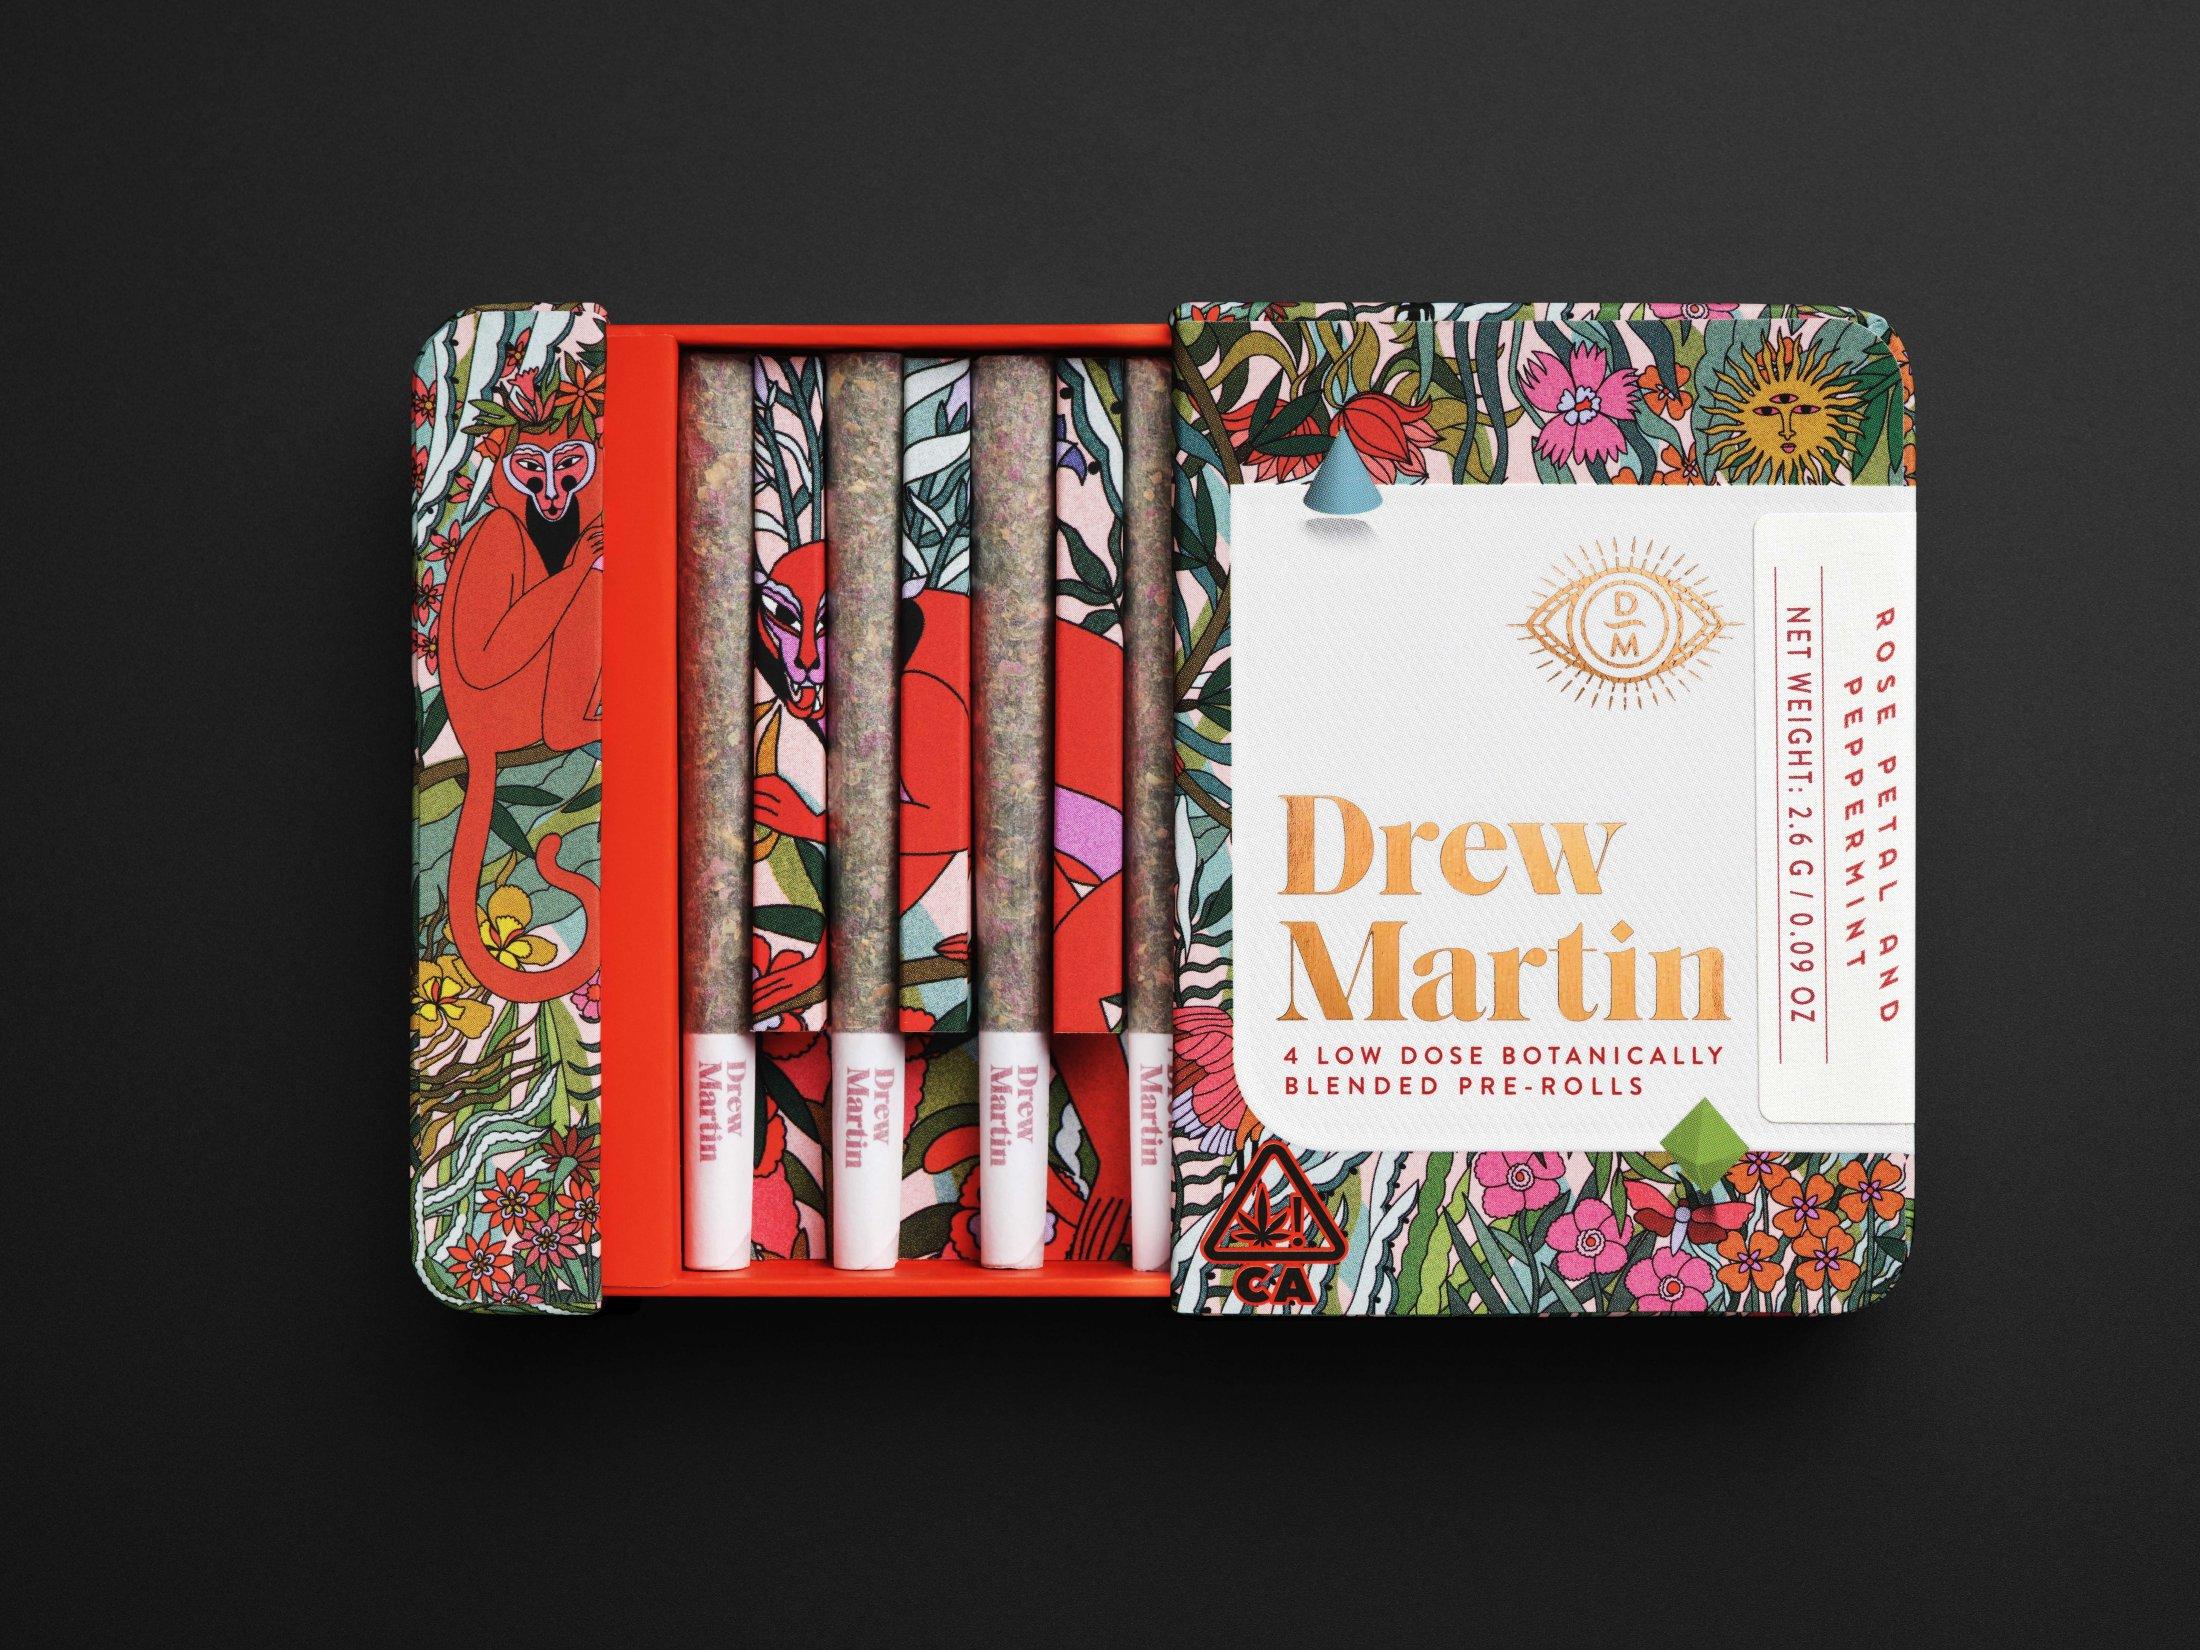 Drew Martin: Drew Martin